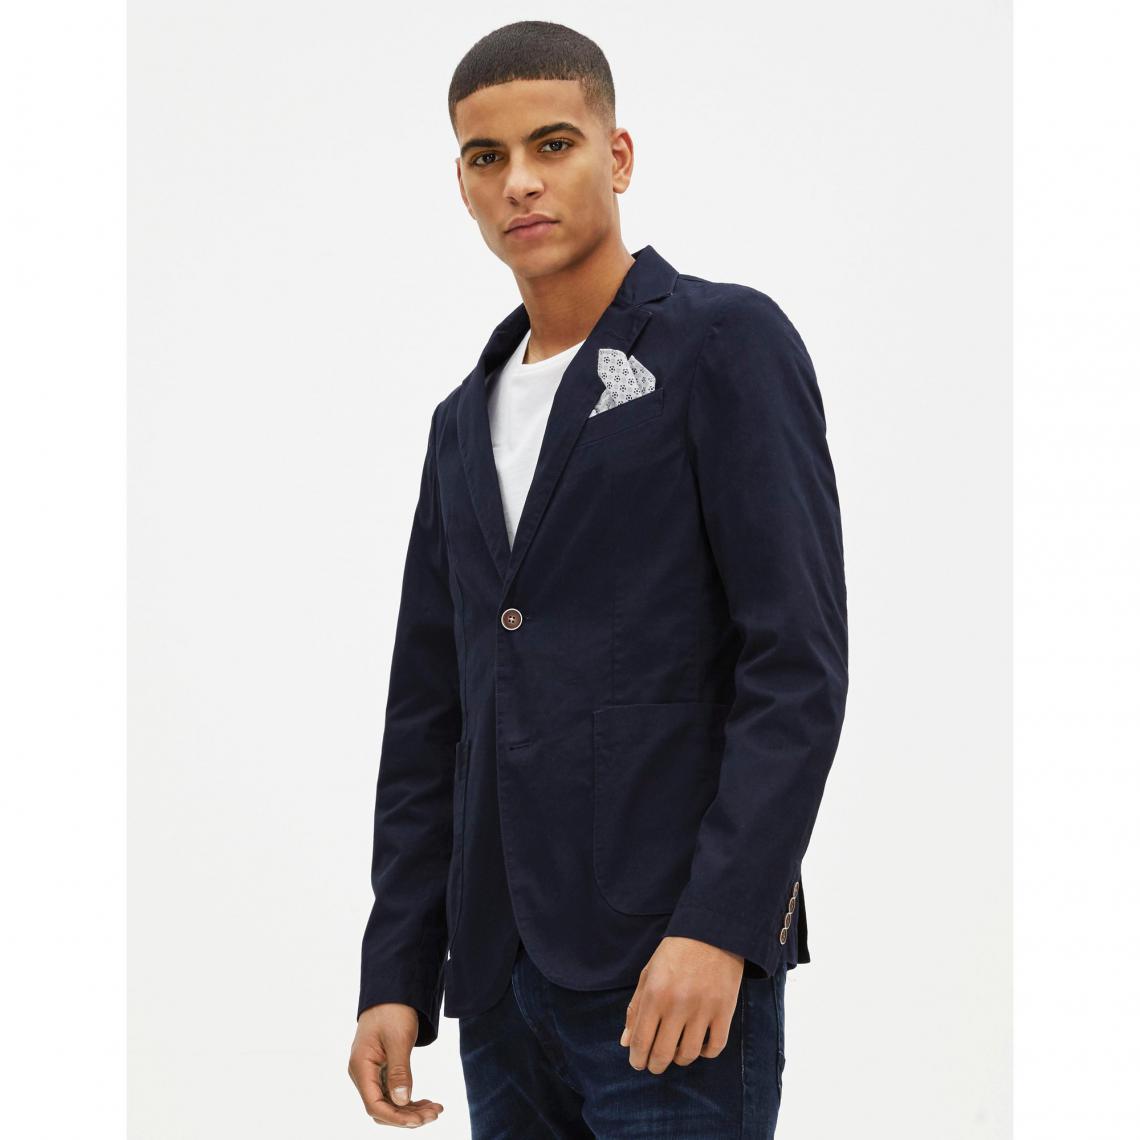 85e1b6724bd2b Veste blazer homme Guone Celio - Bleu Marine | 3 SUISSES